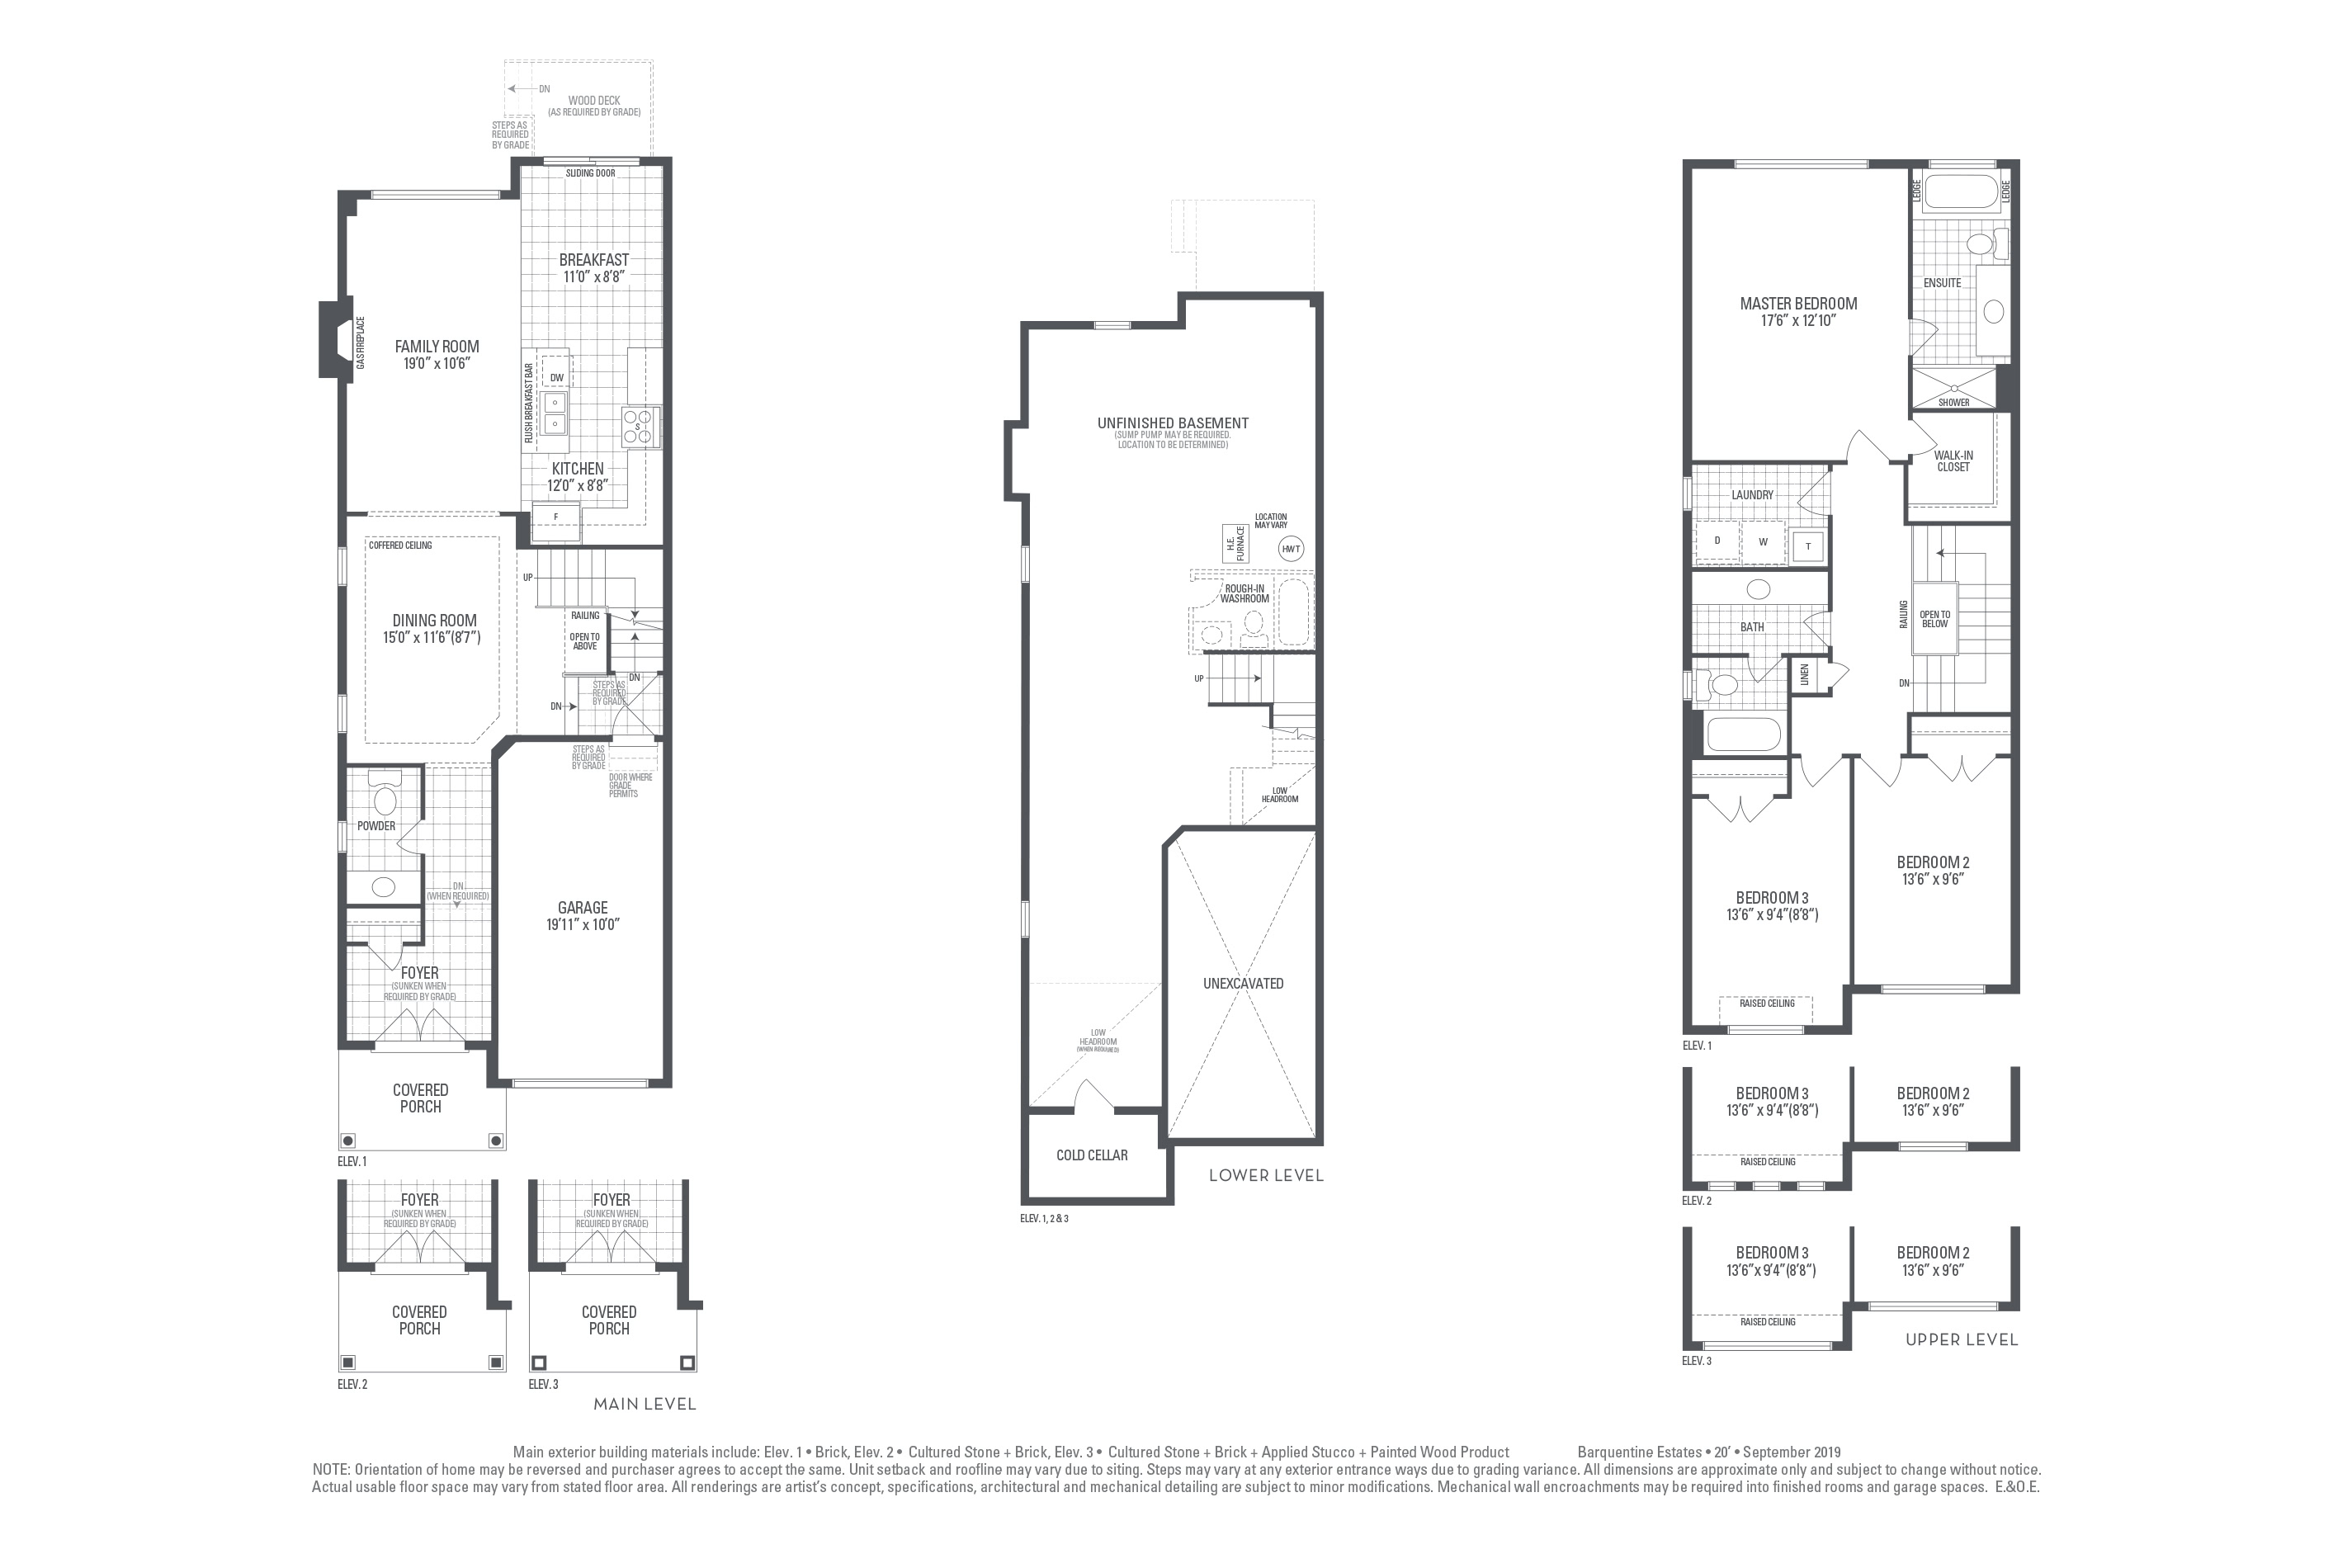 Hudson 05 Elev. 3 Floorplan